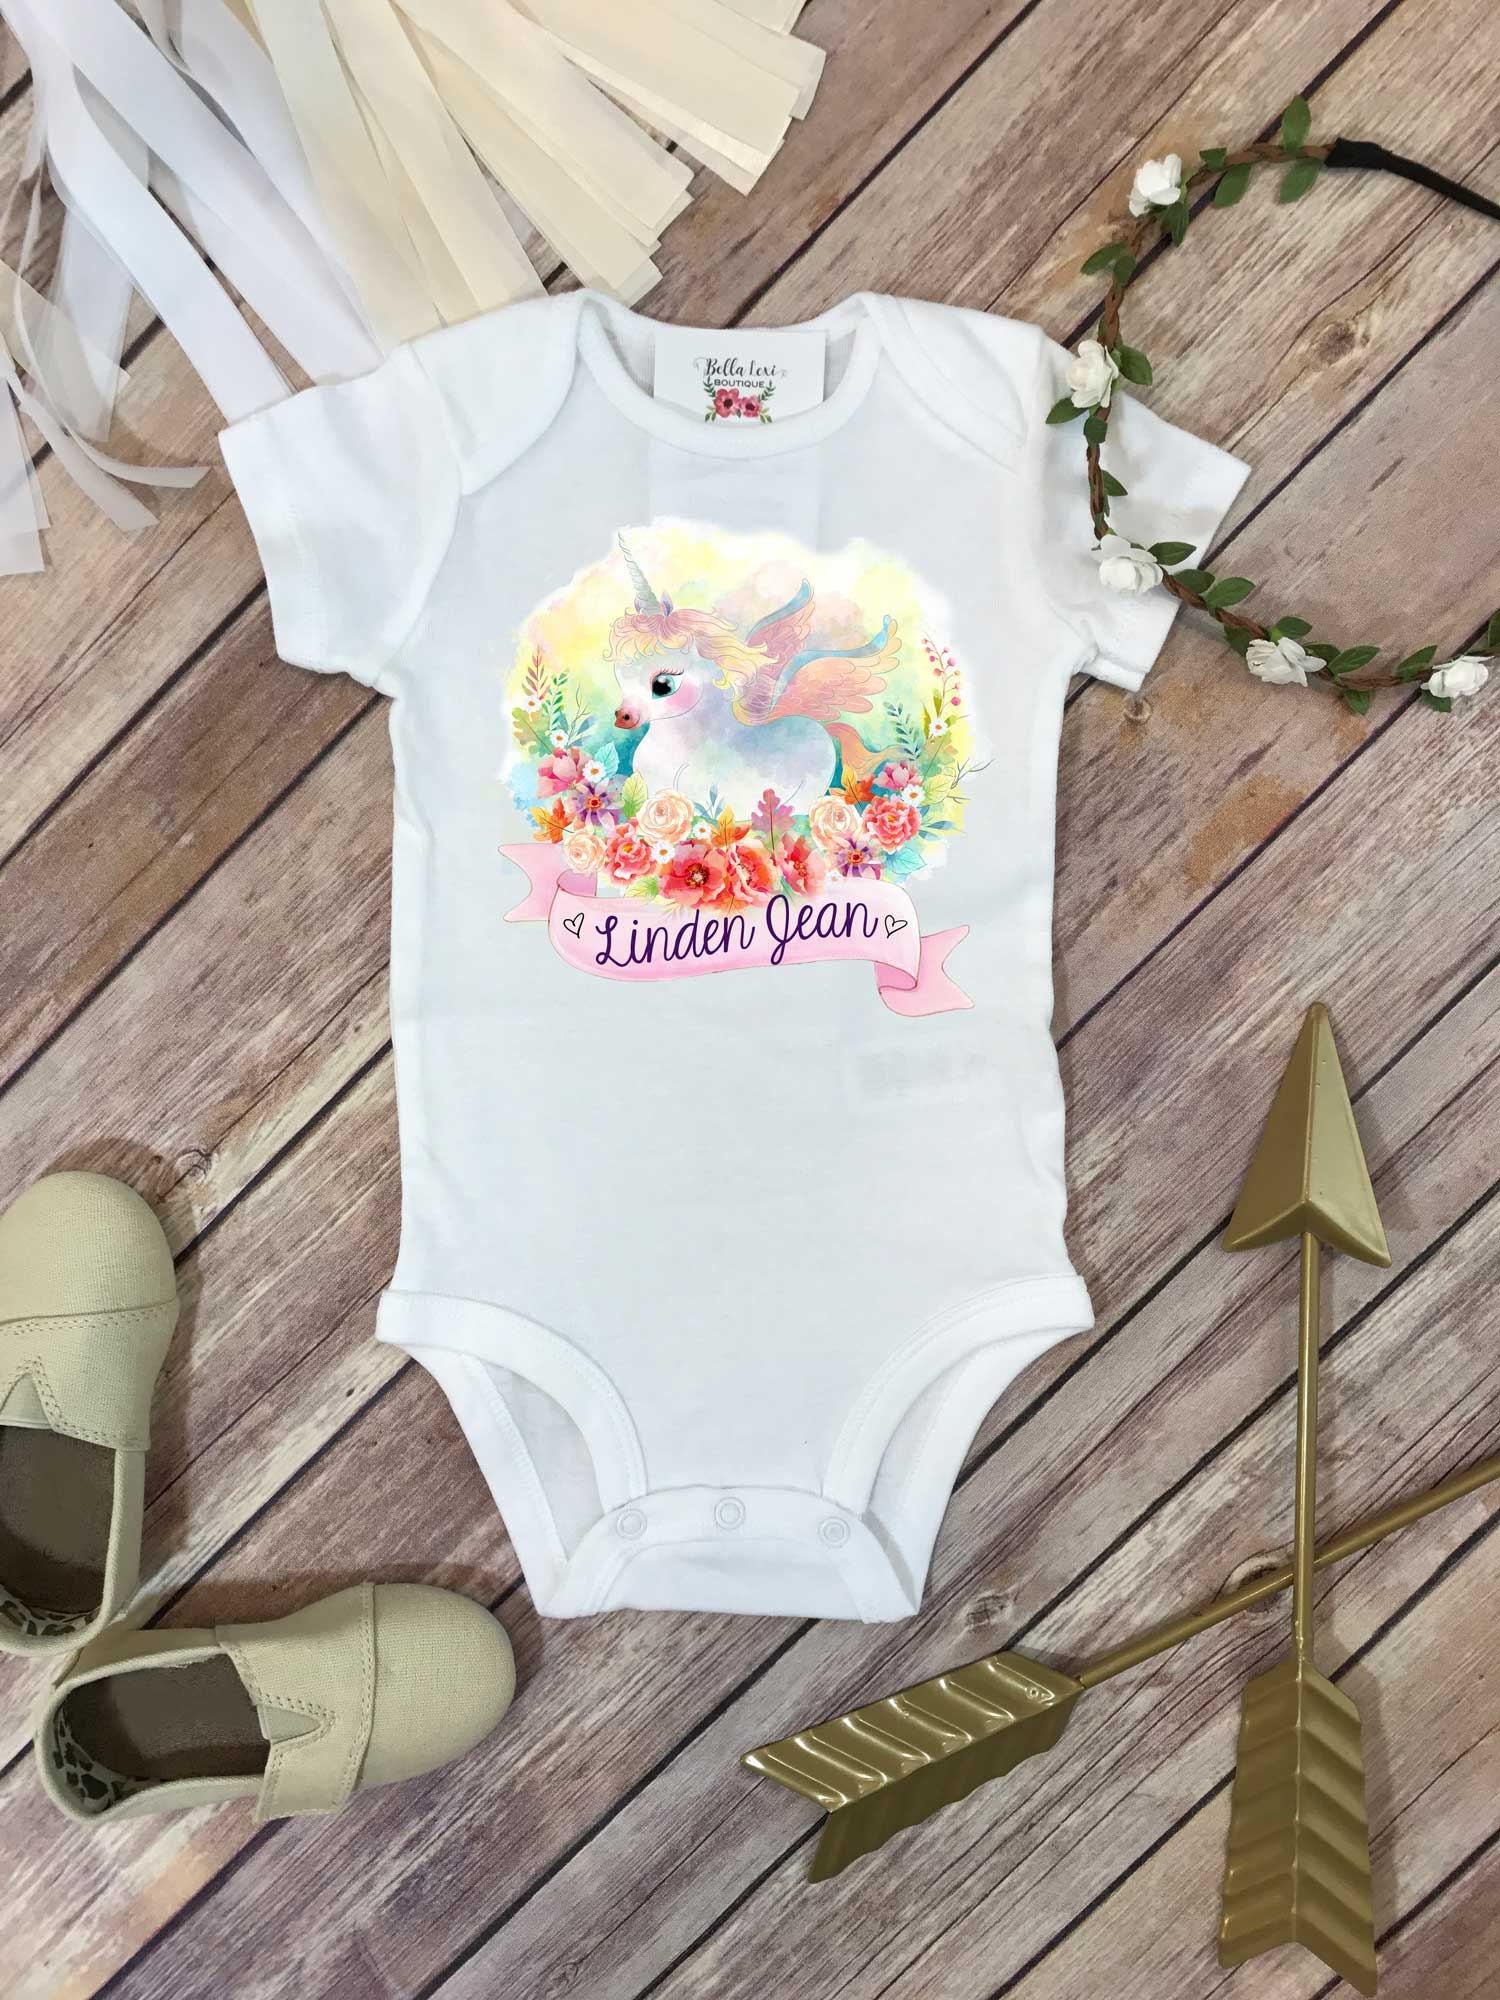 Baby Shower Gift, Unicorn Shirt, Personalized Baby Gift, Custom Baby Gift, Unicorn Bodysuit, Niece Gift, Cute Girl Clothes, Unicorn Theme